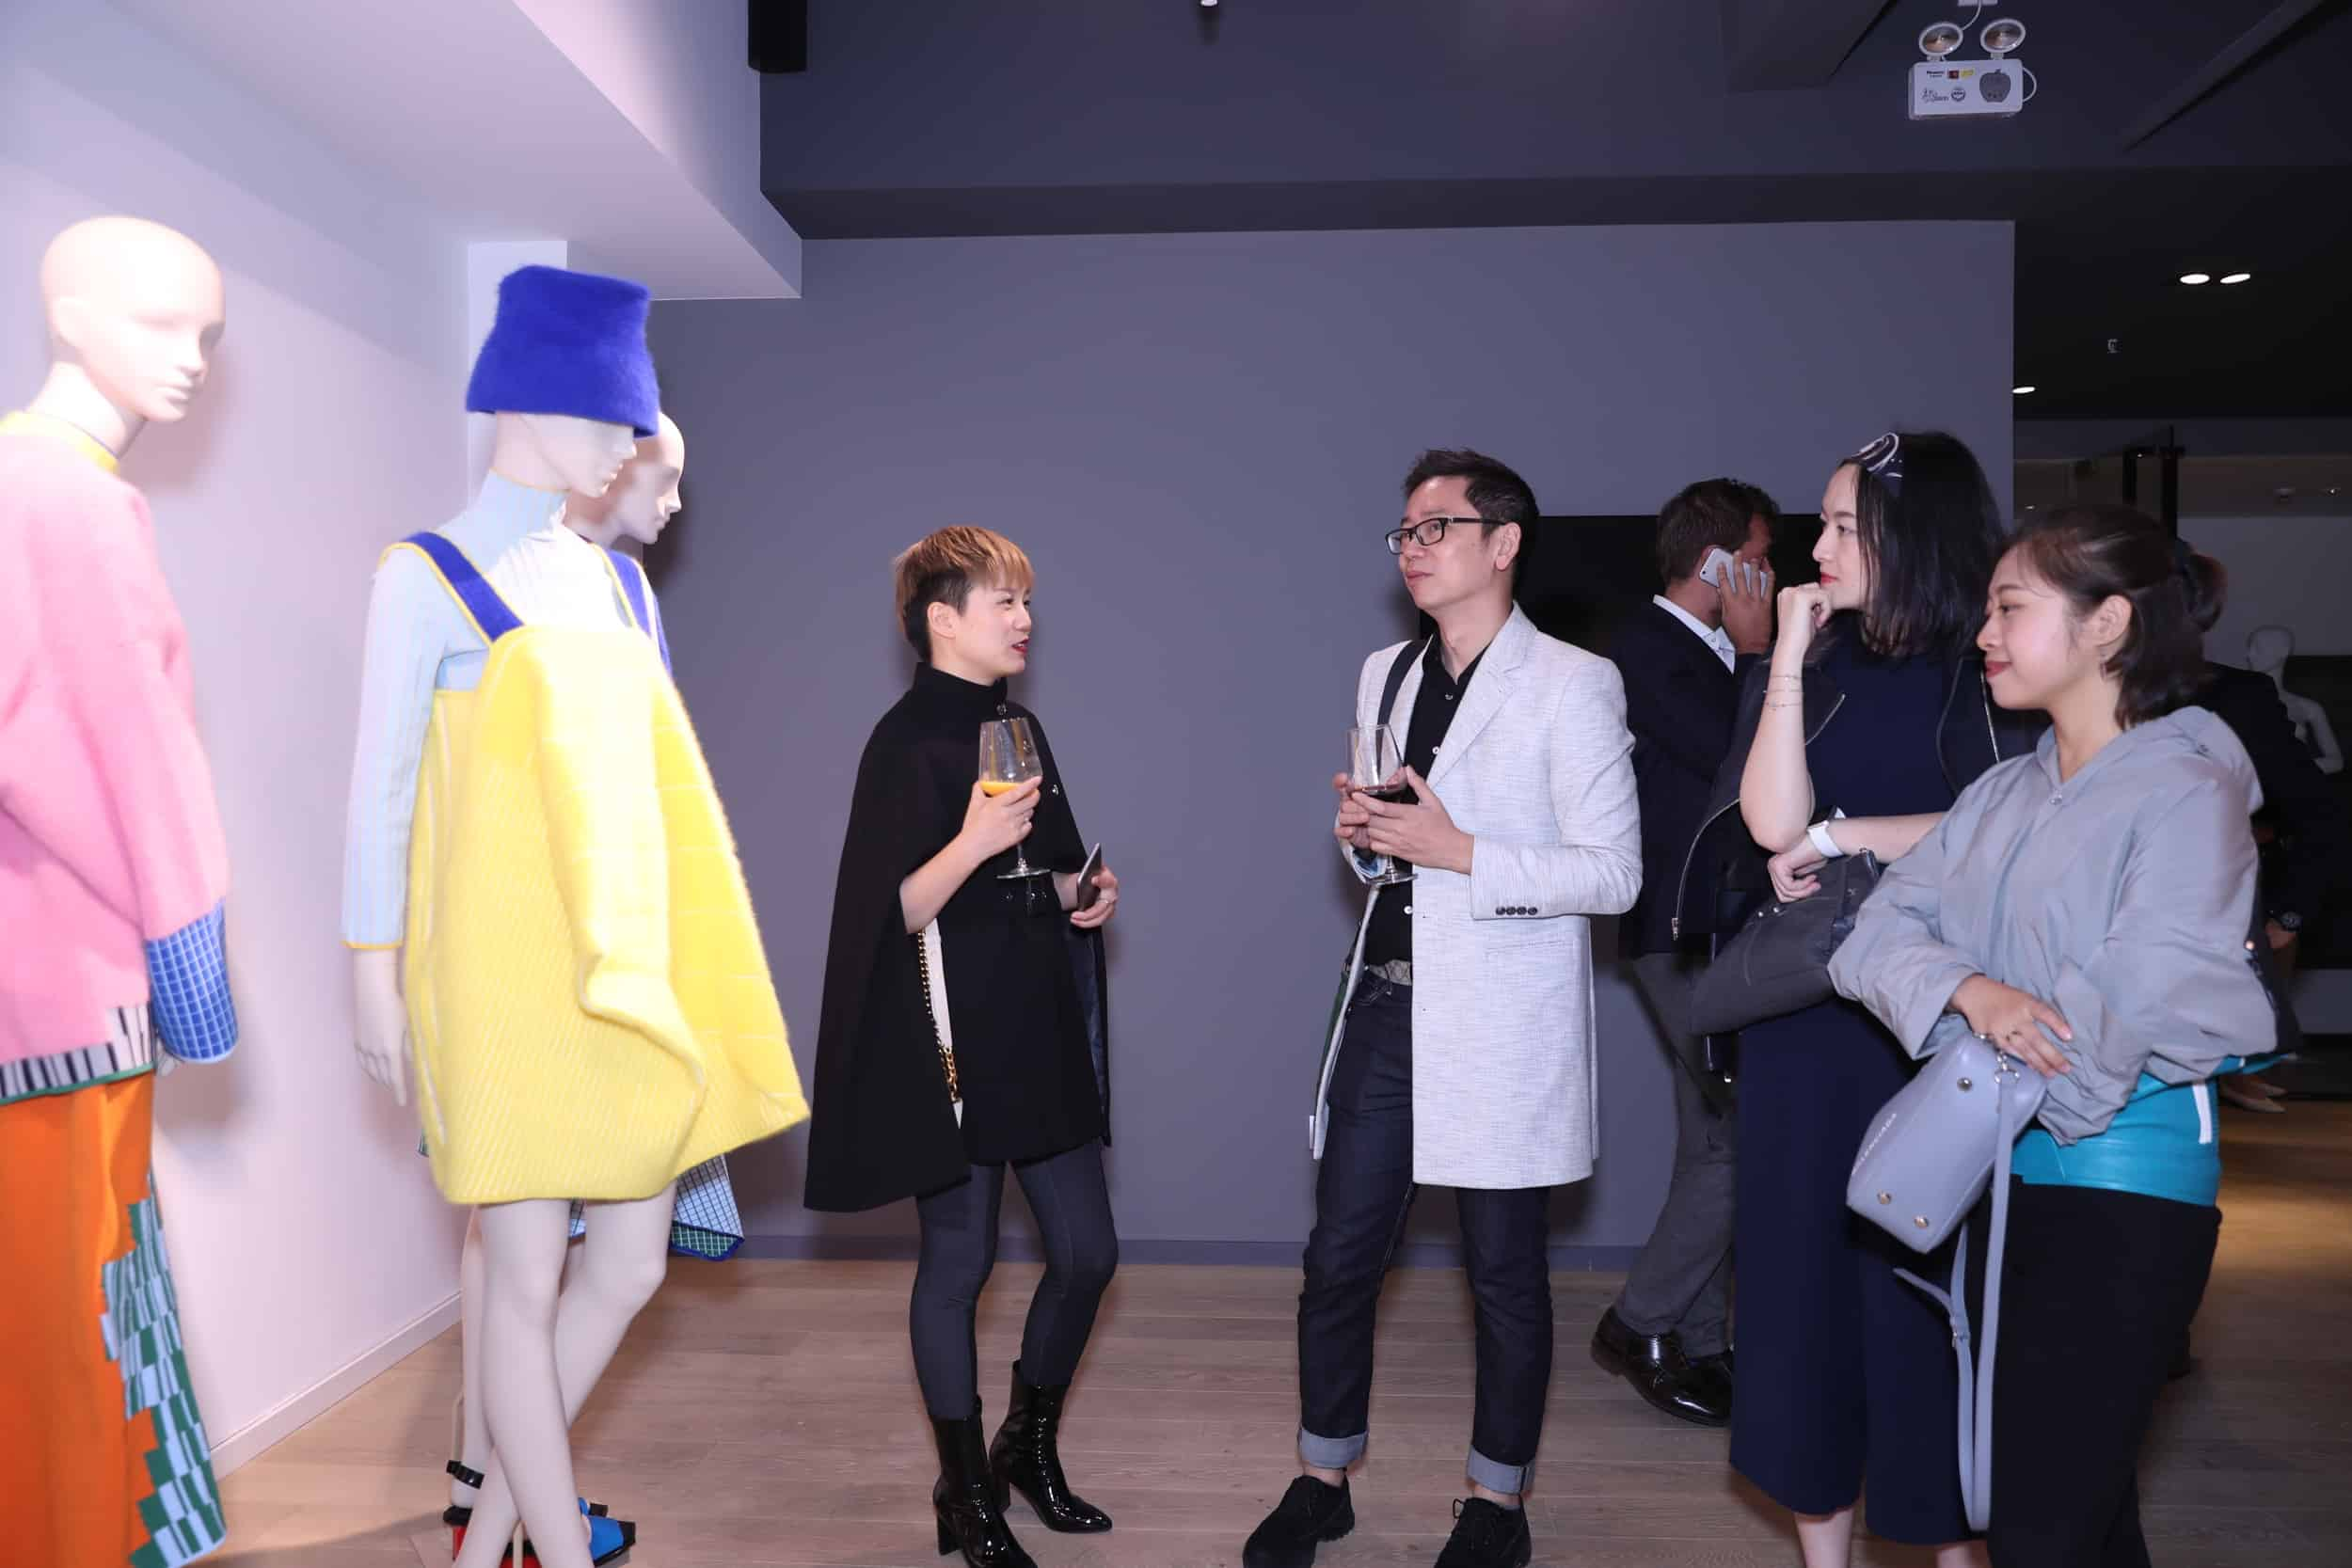 tribe-mannequins-shanghai-display-05